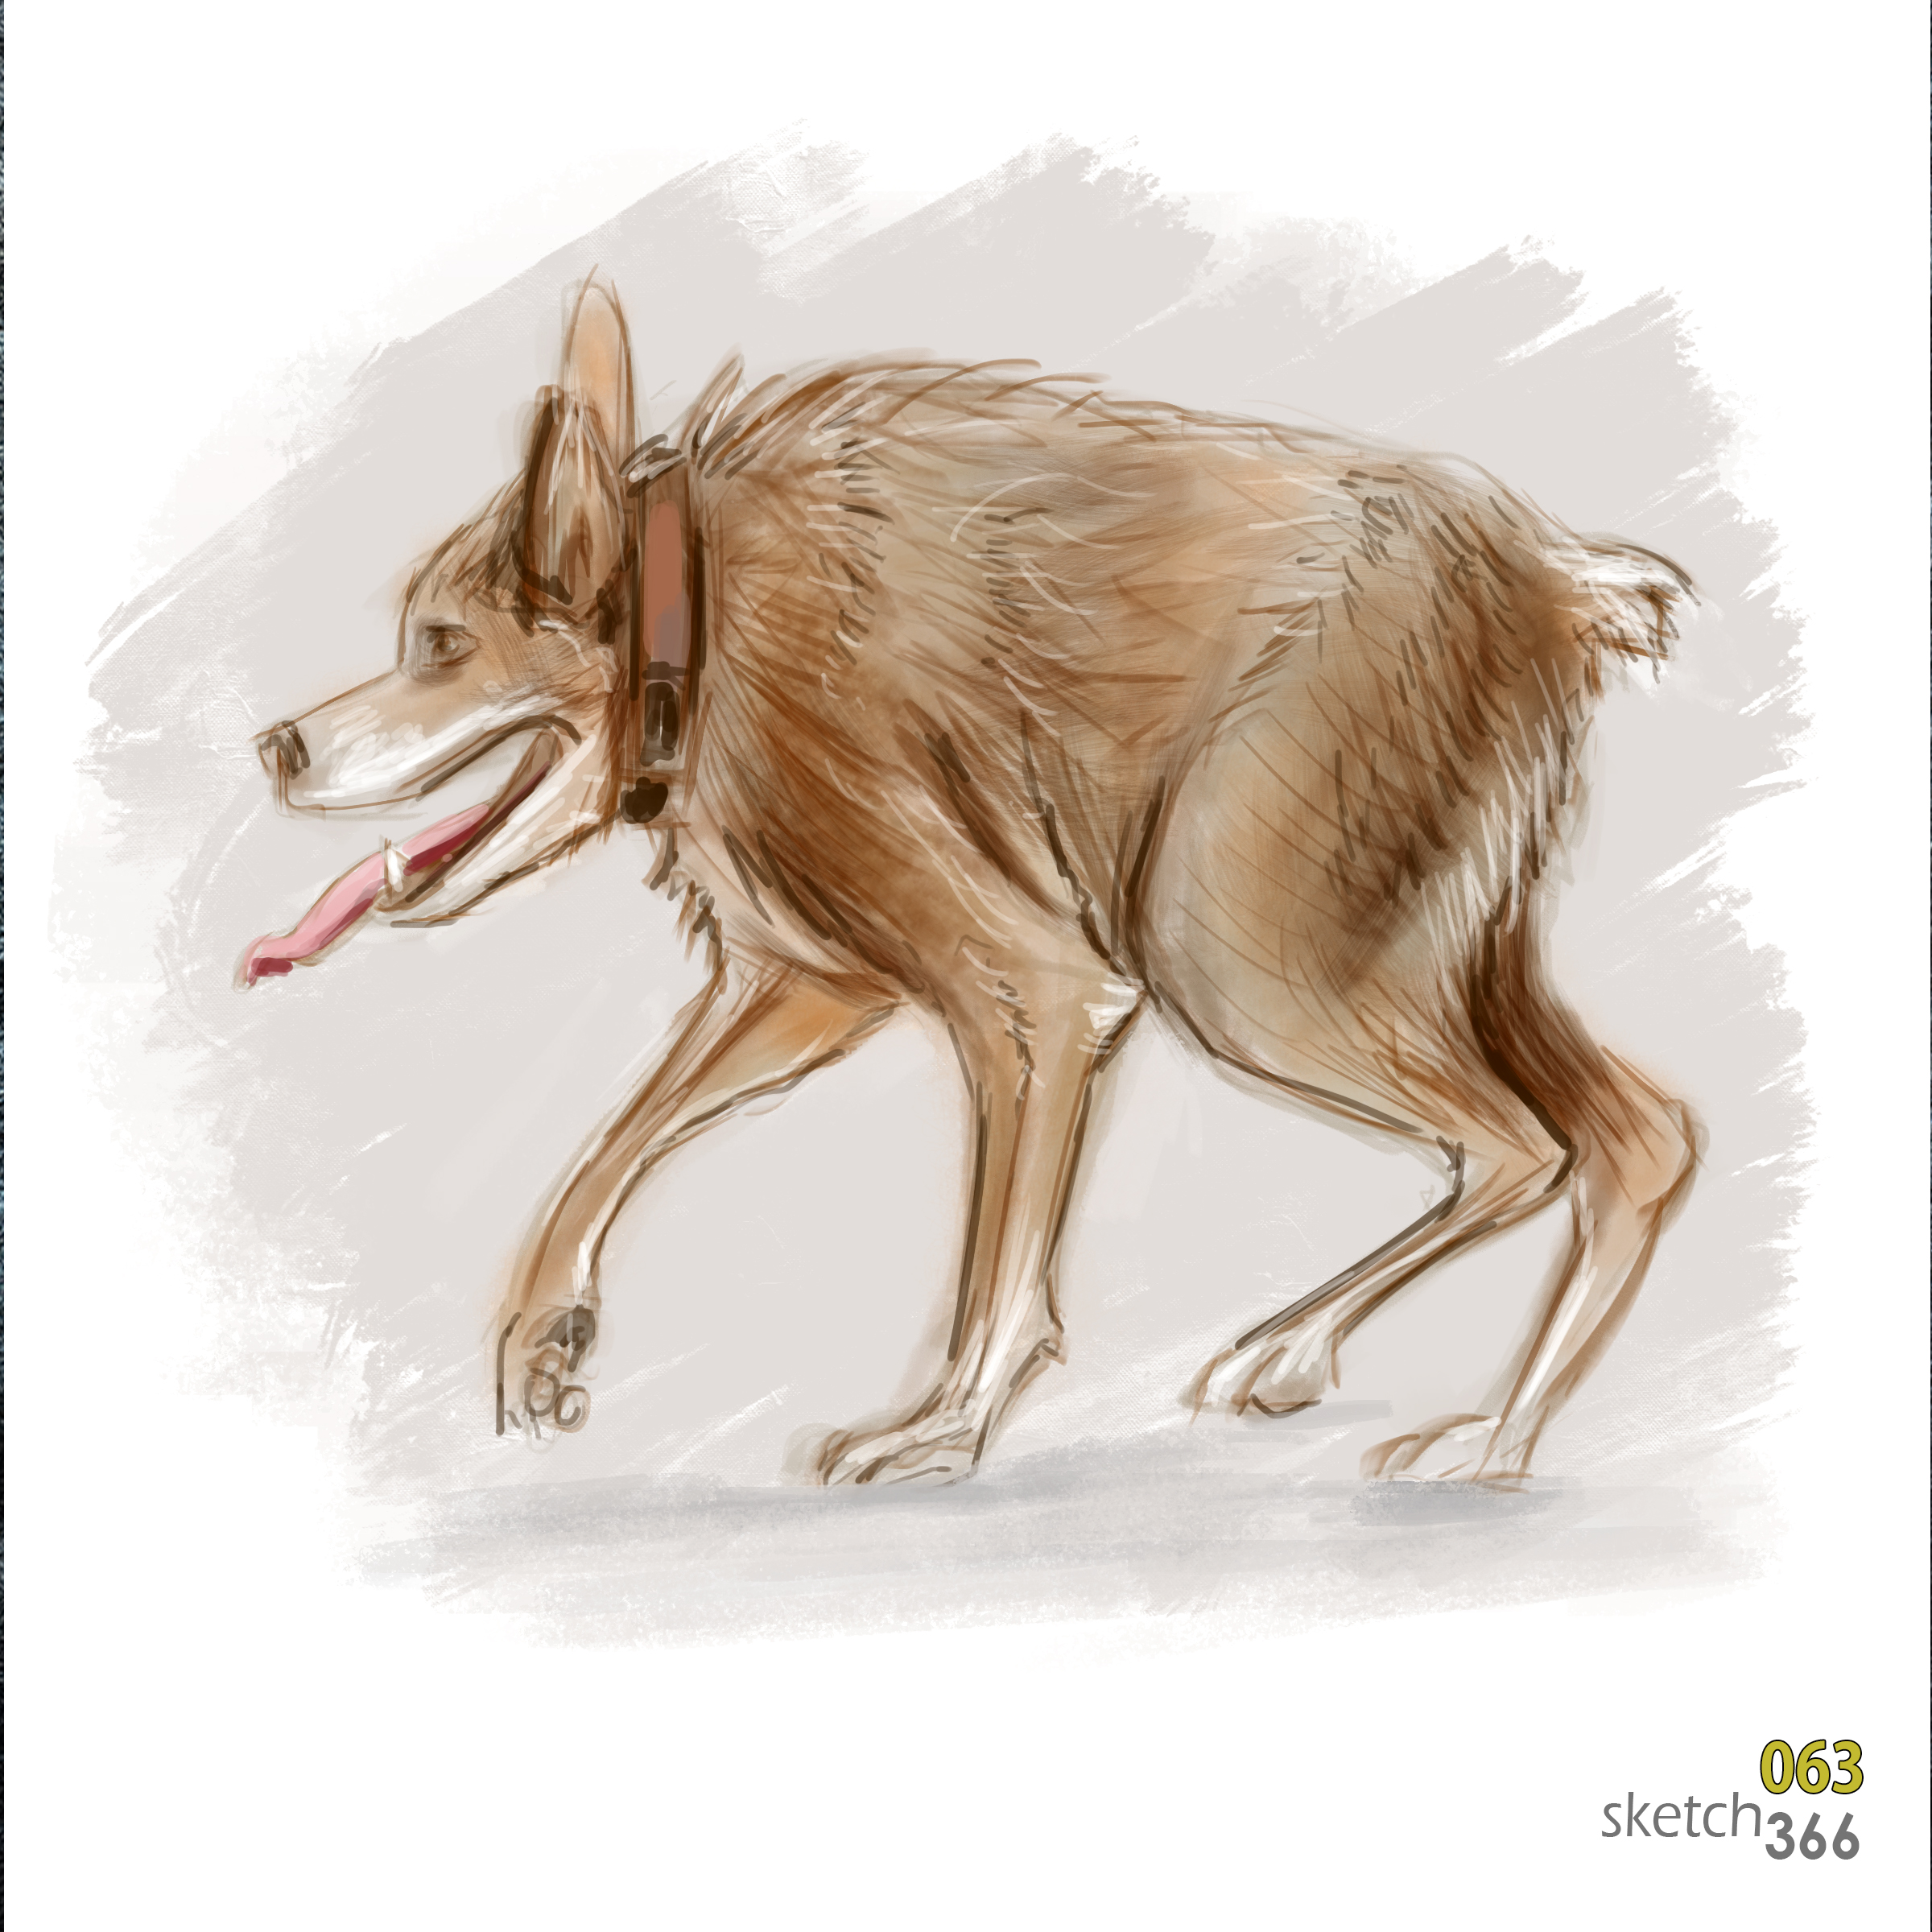 hunch-back dog - digital paint